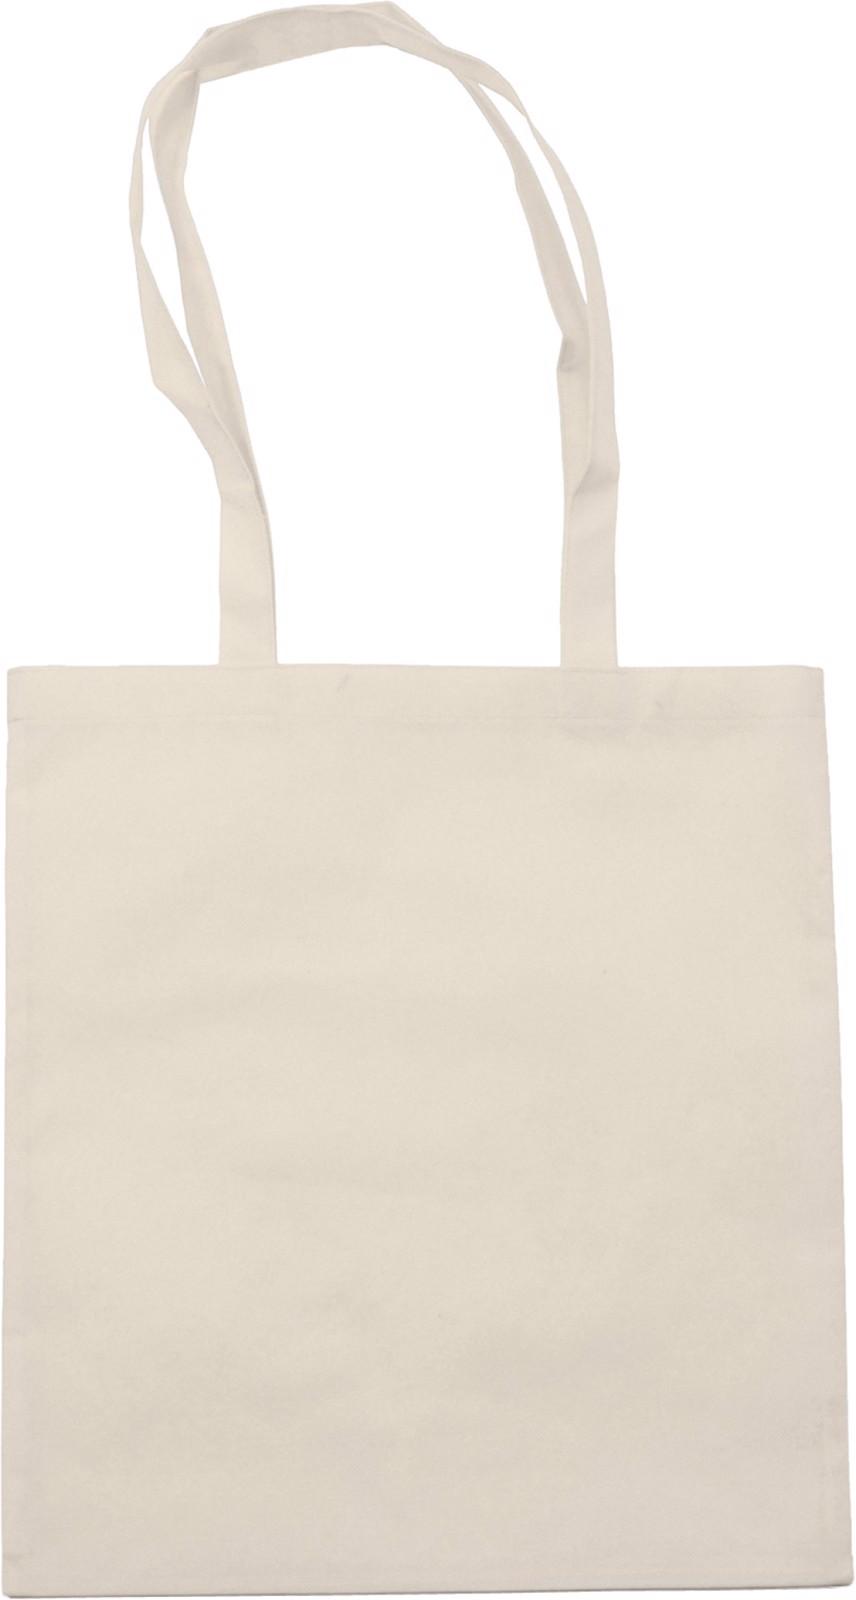 Nonwoven (80 gr/m²) shopping bag - Khaki